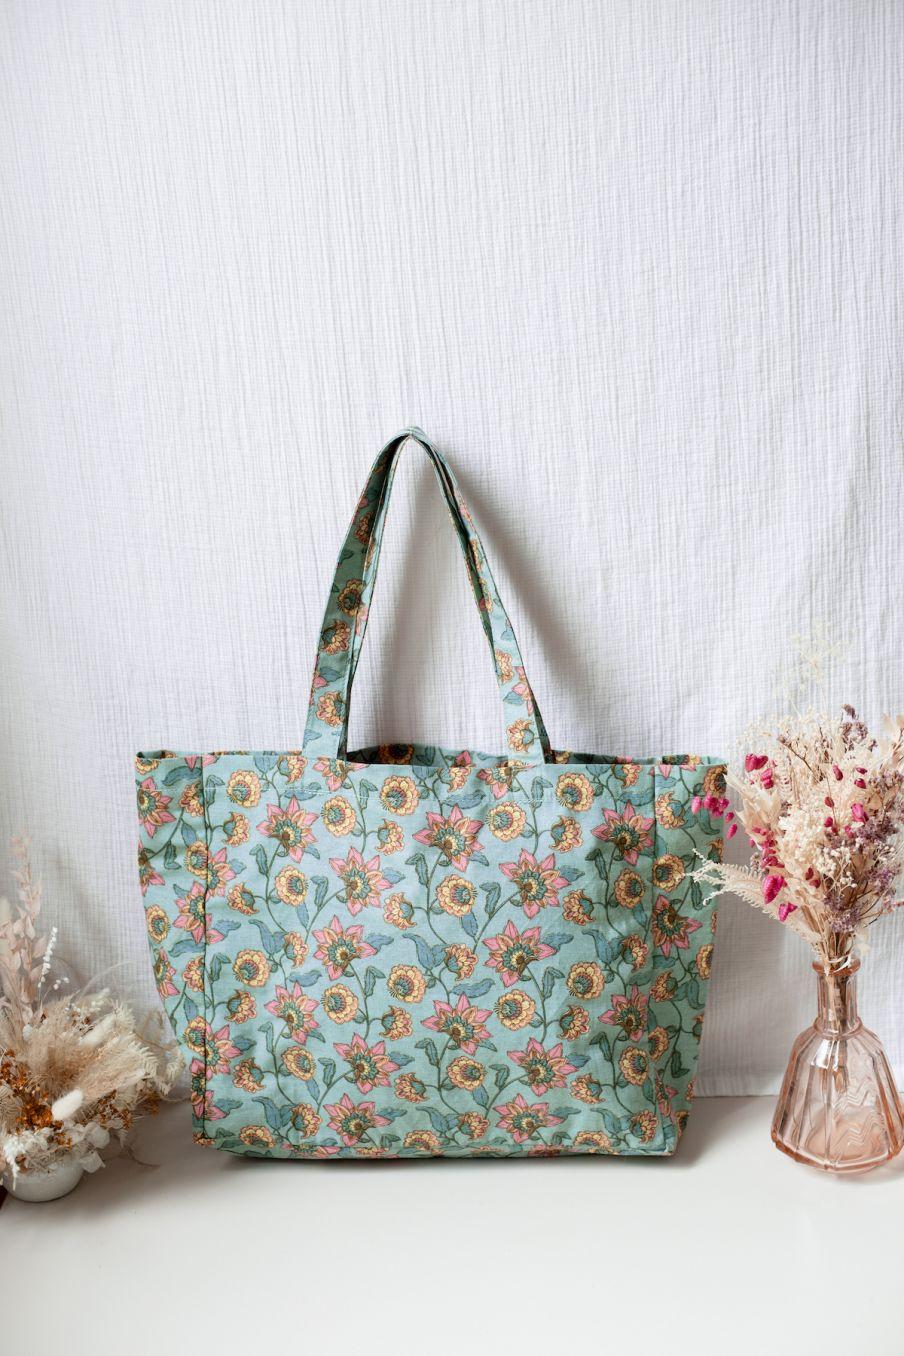 boheme chic vintage cabas femme beverly turquoise flowers